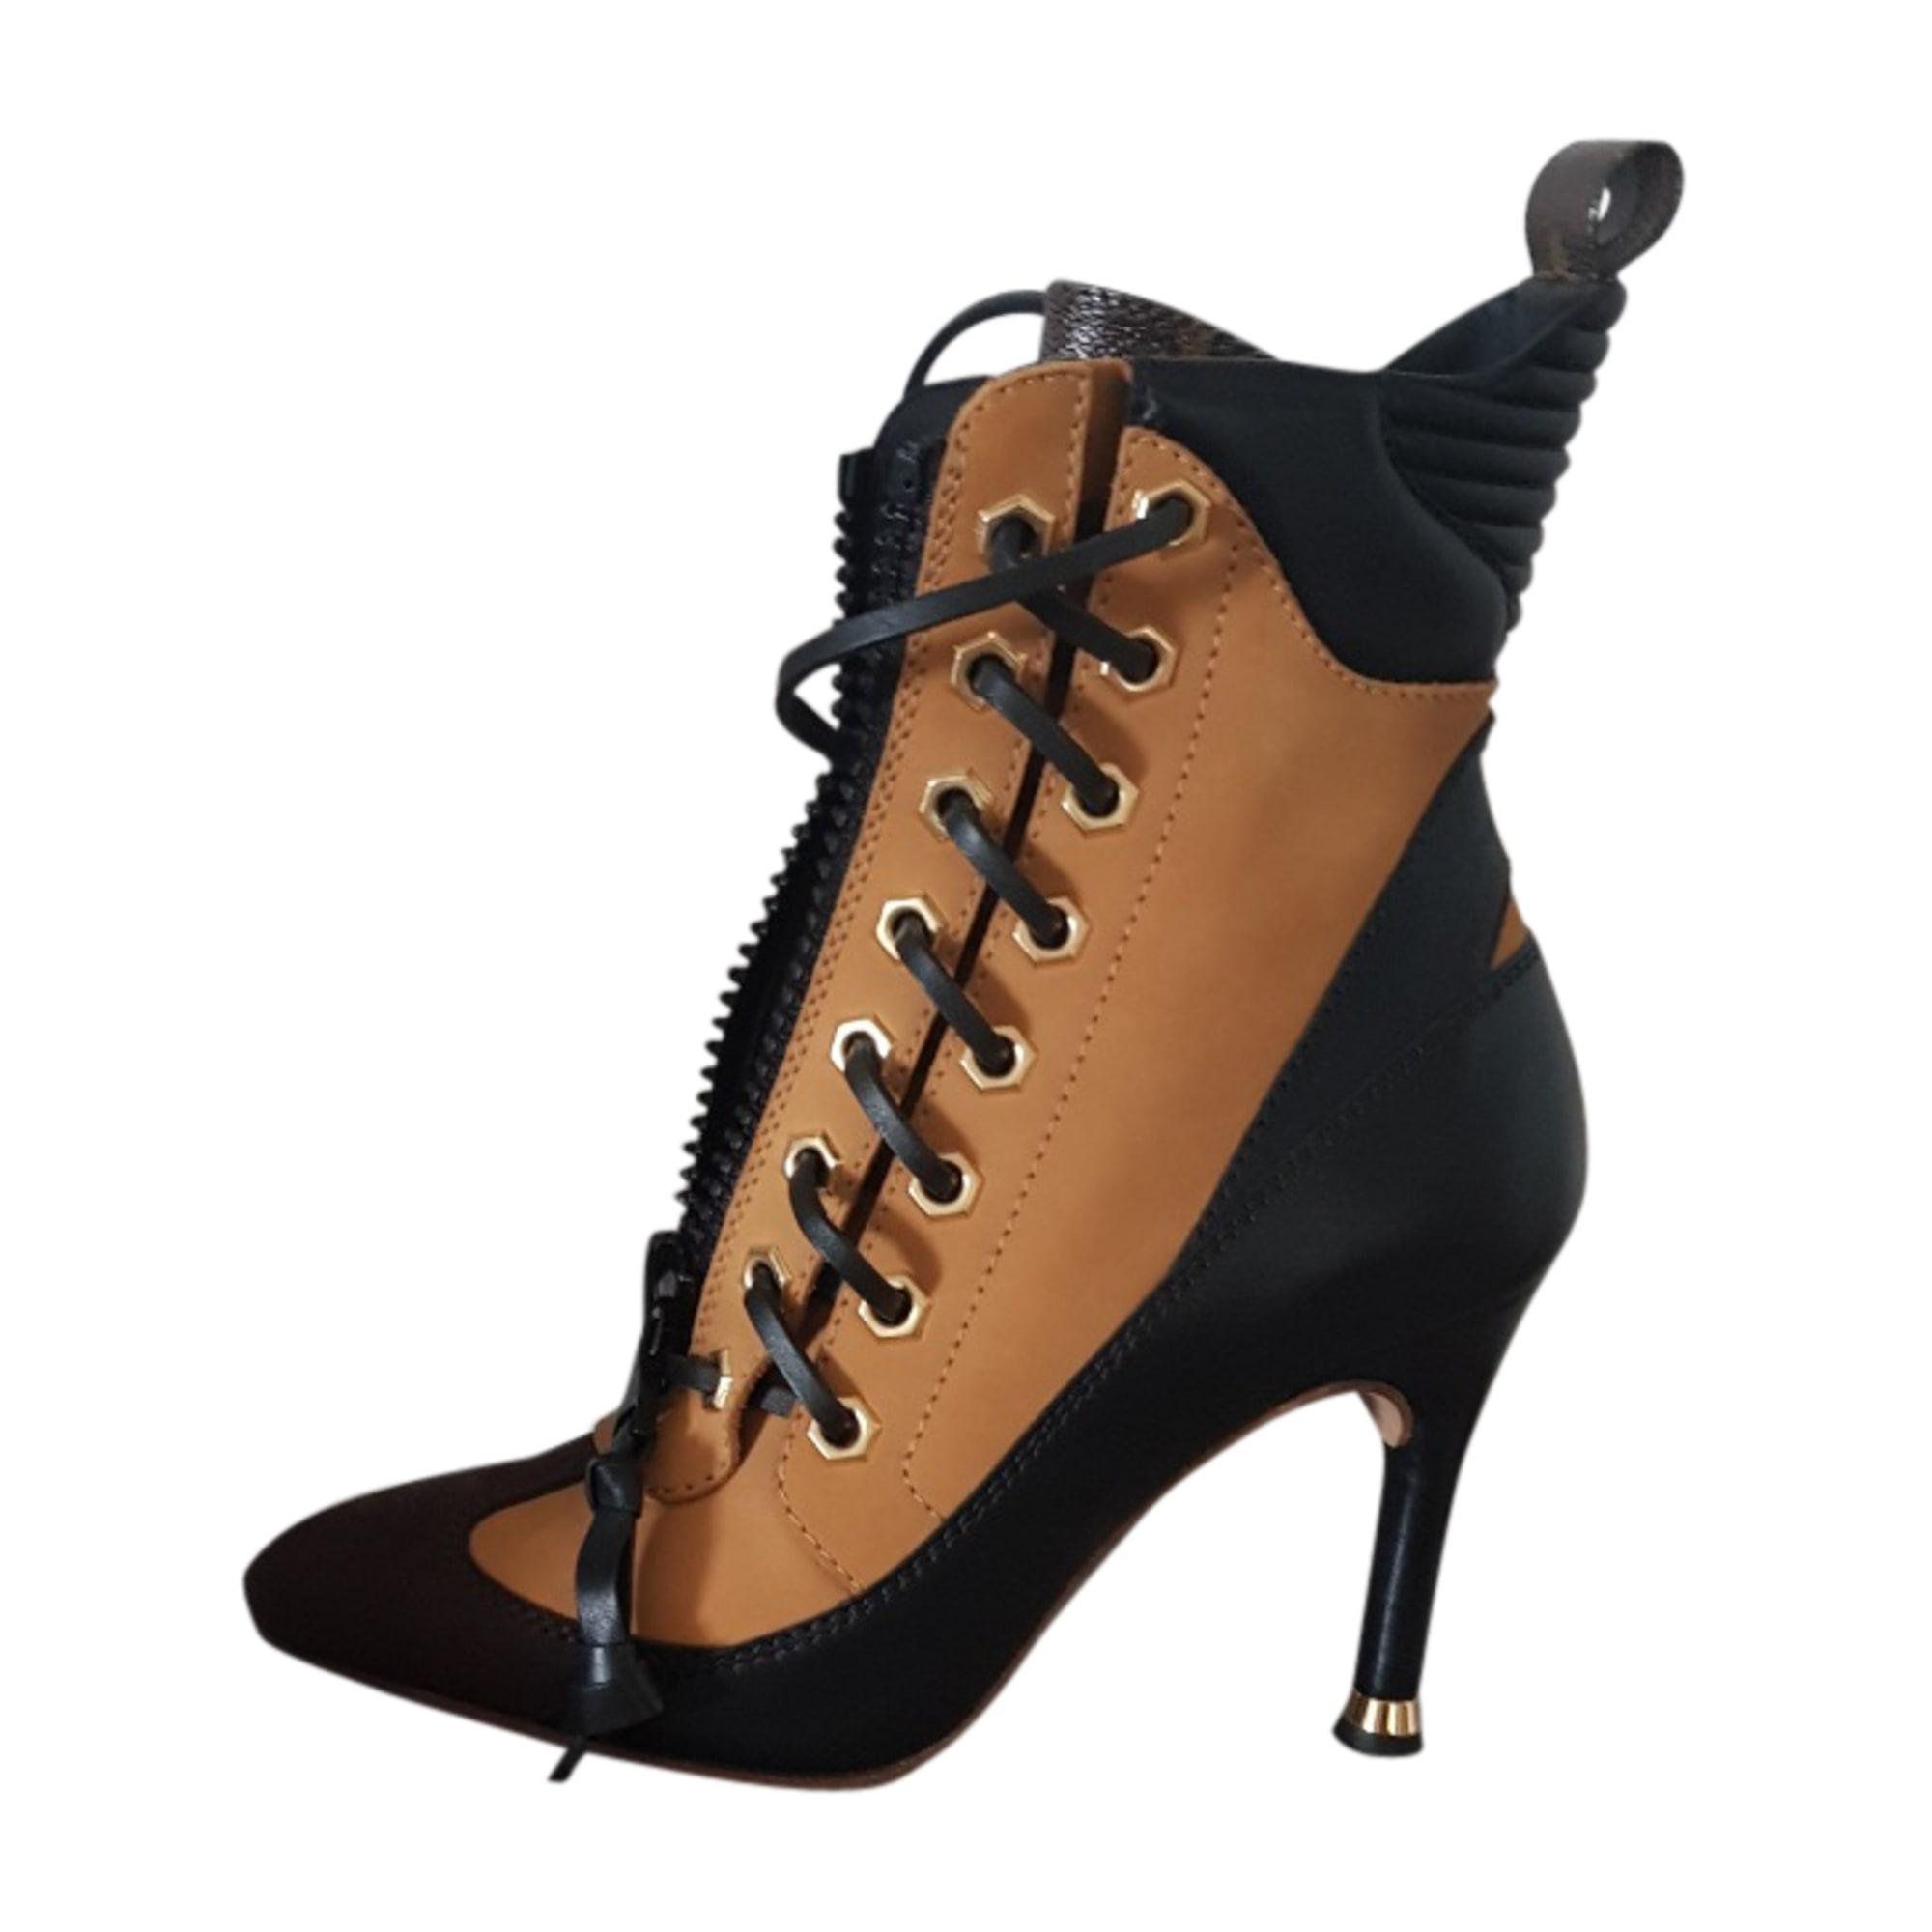 40cd4513b60 High Heel Ankle Boots LOUIS VUITTON 36 beige - 7701703